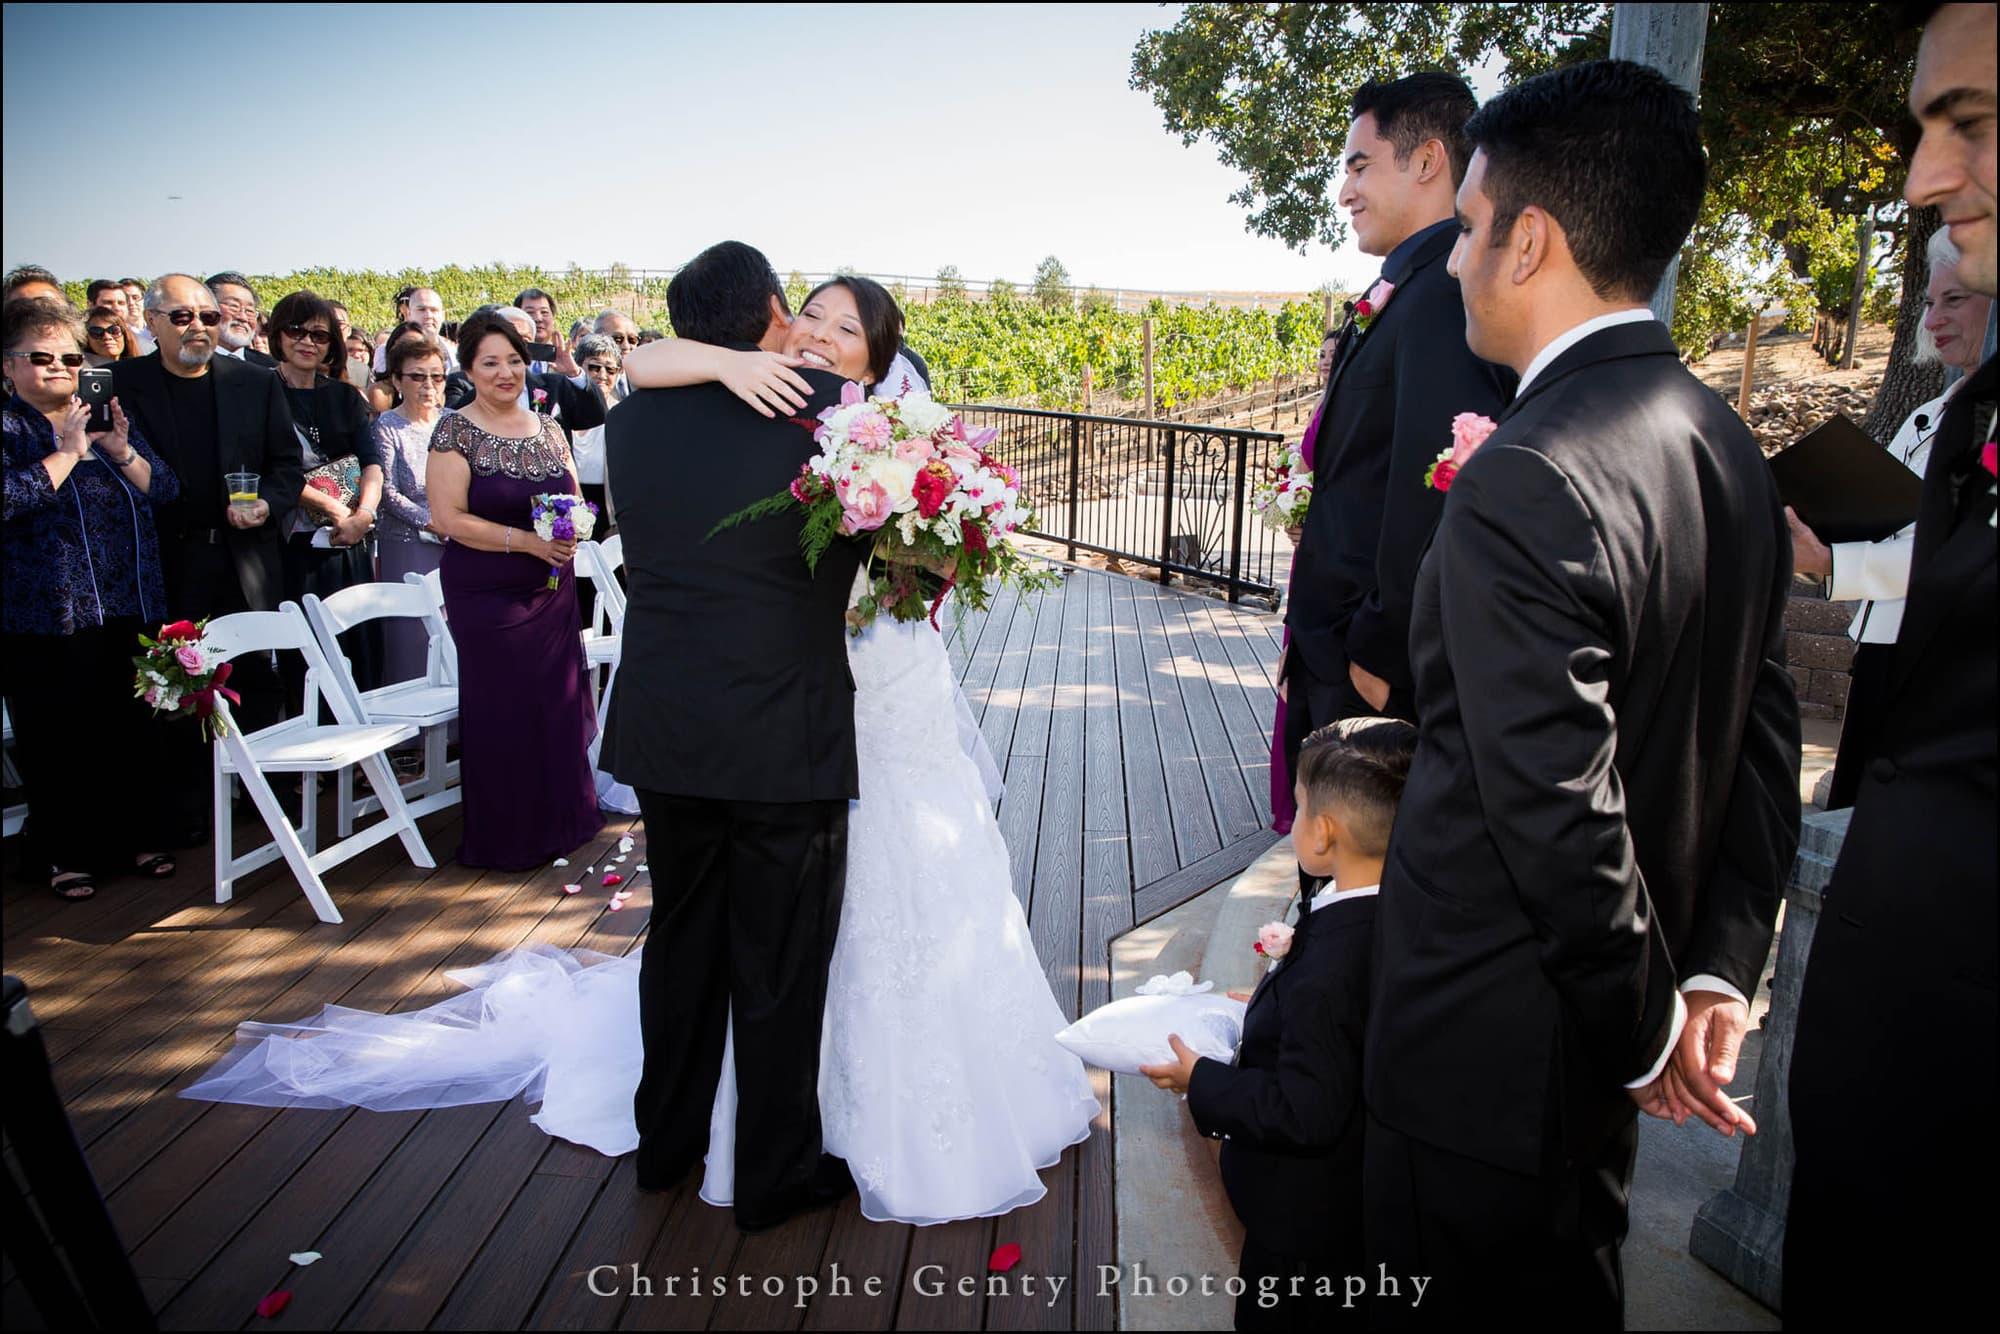 Wedding Photography at The Meritage, Napa, Ca